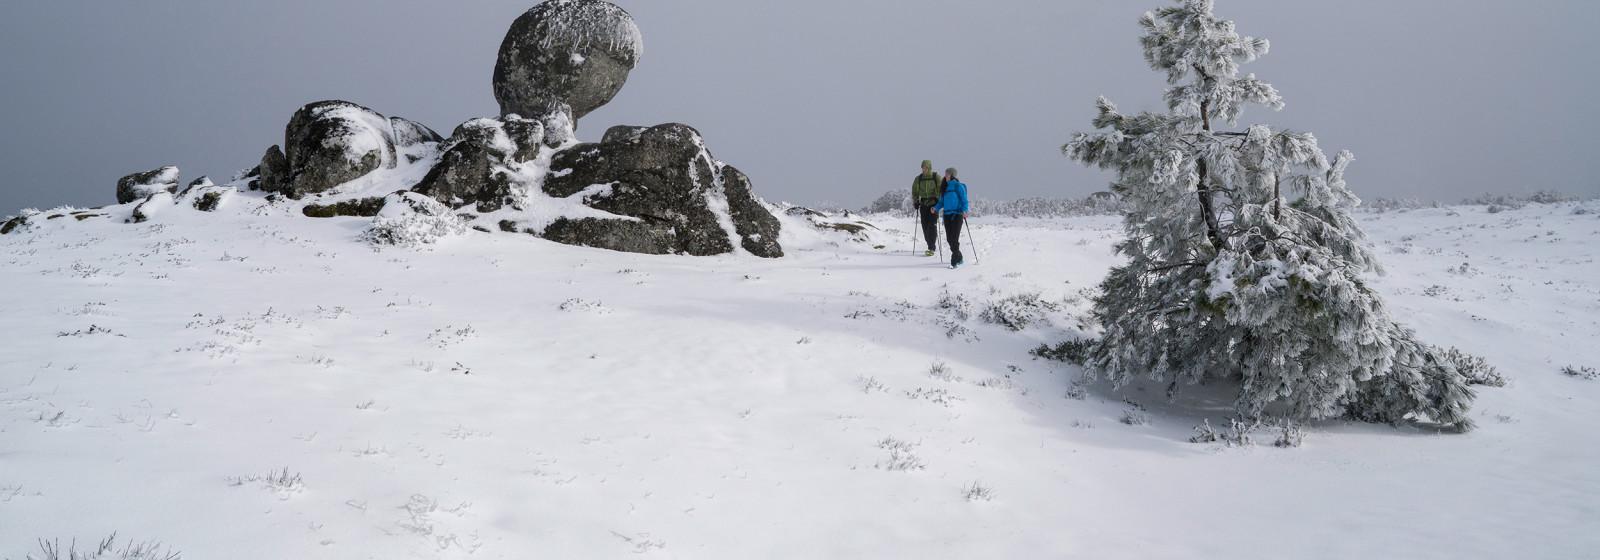 Winterwanderung am Torre, Serra de Estrella, Portugal.